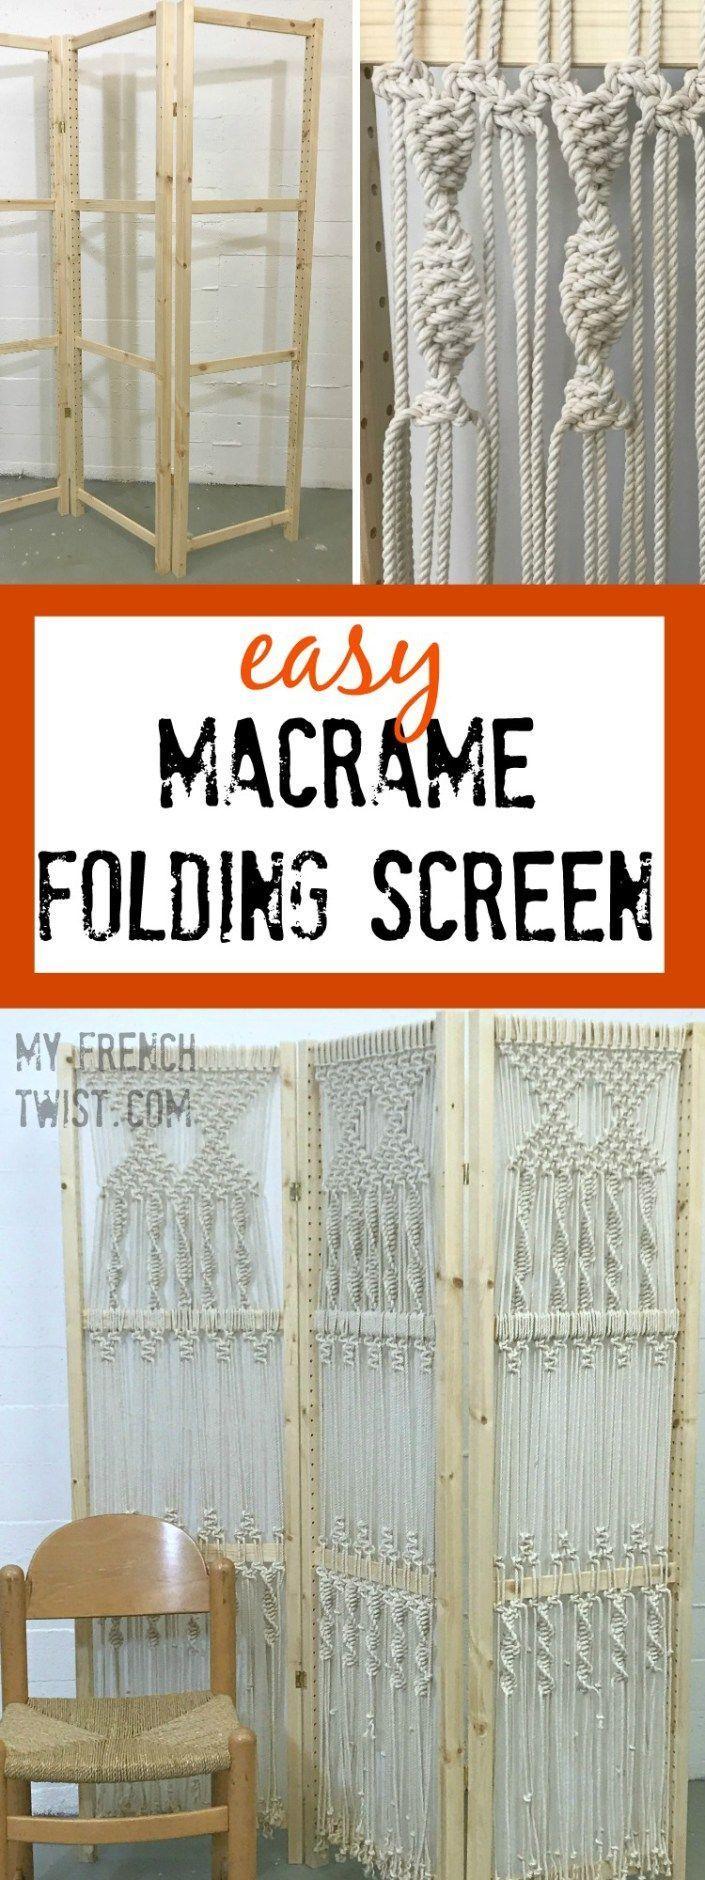 easy macrame folding screen | Diy room divider, Macrame ...